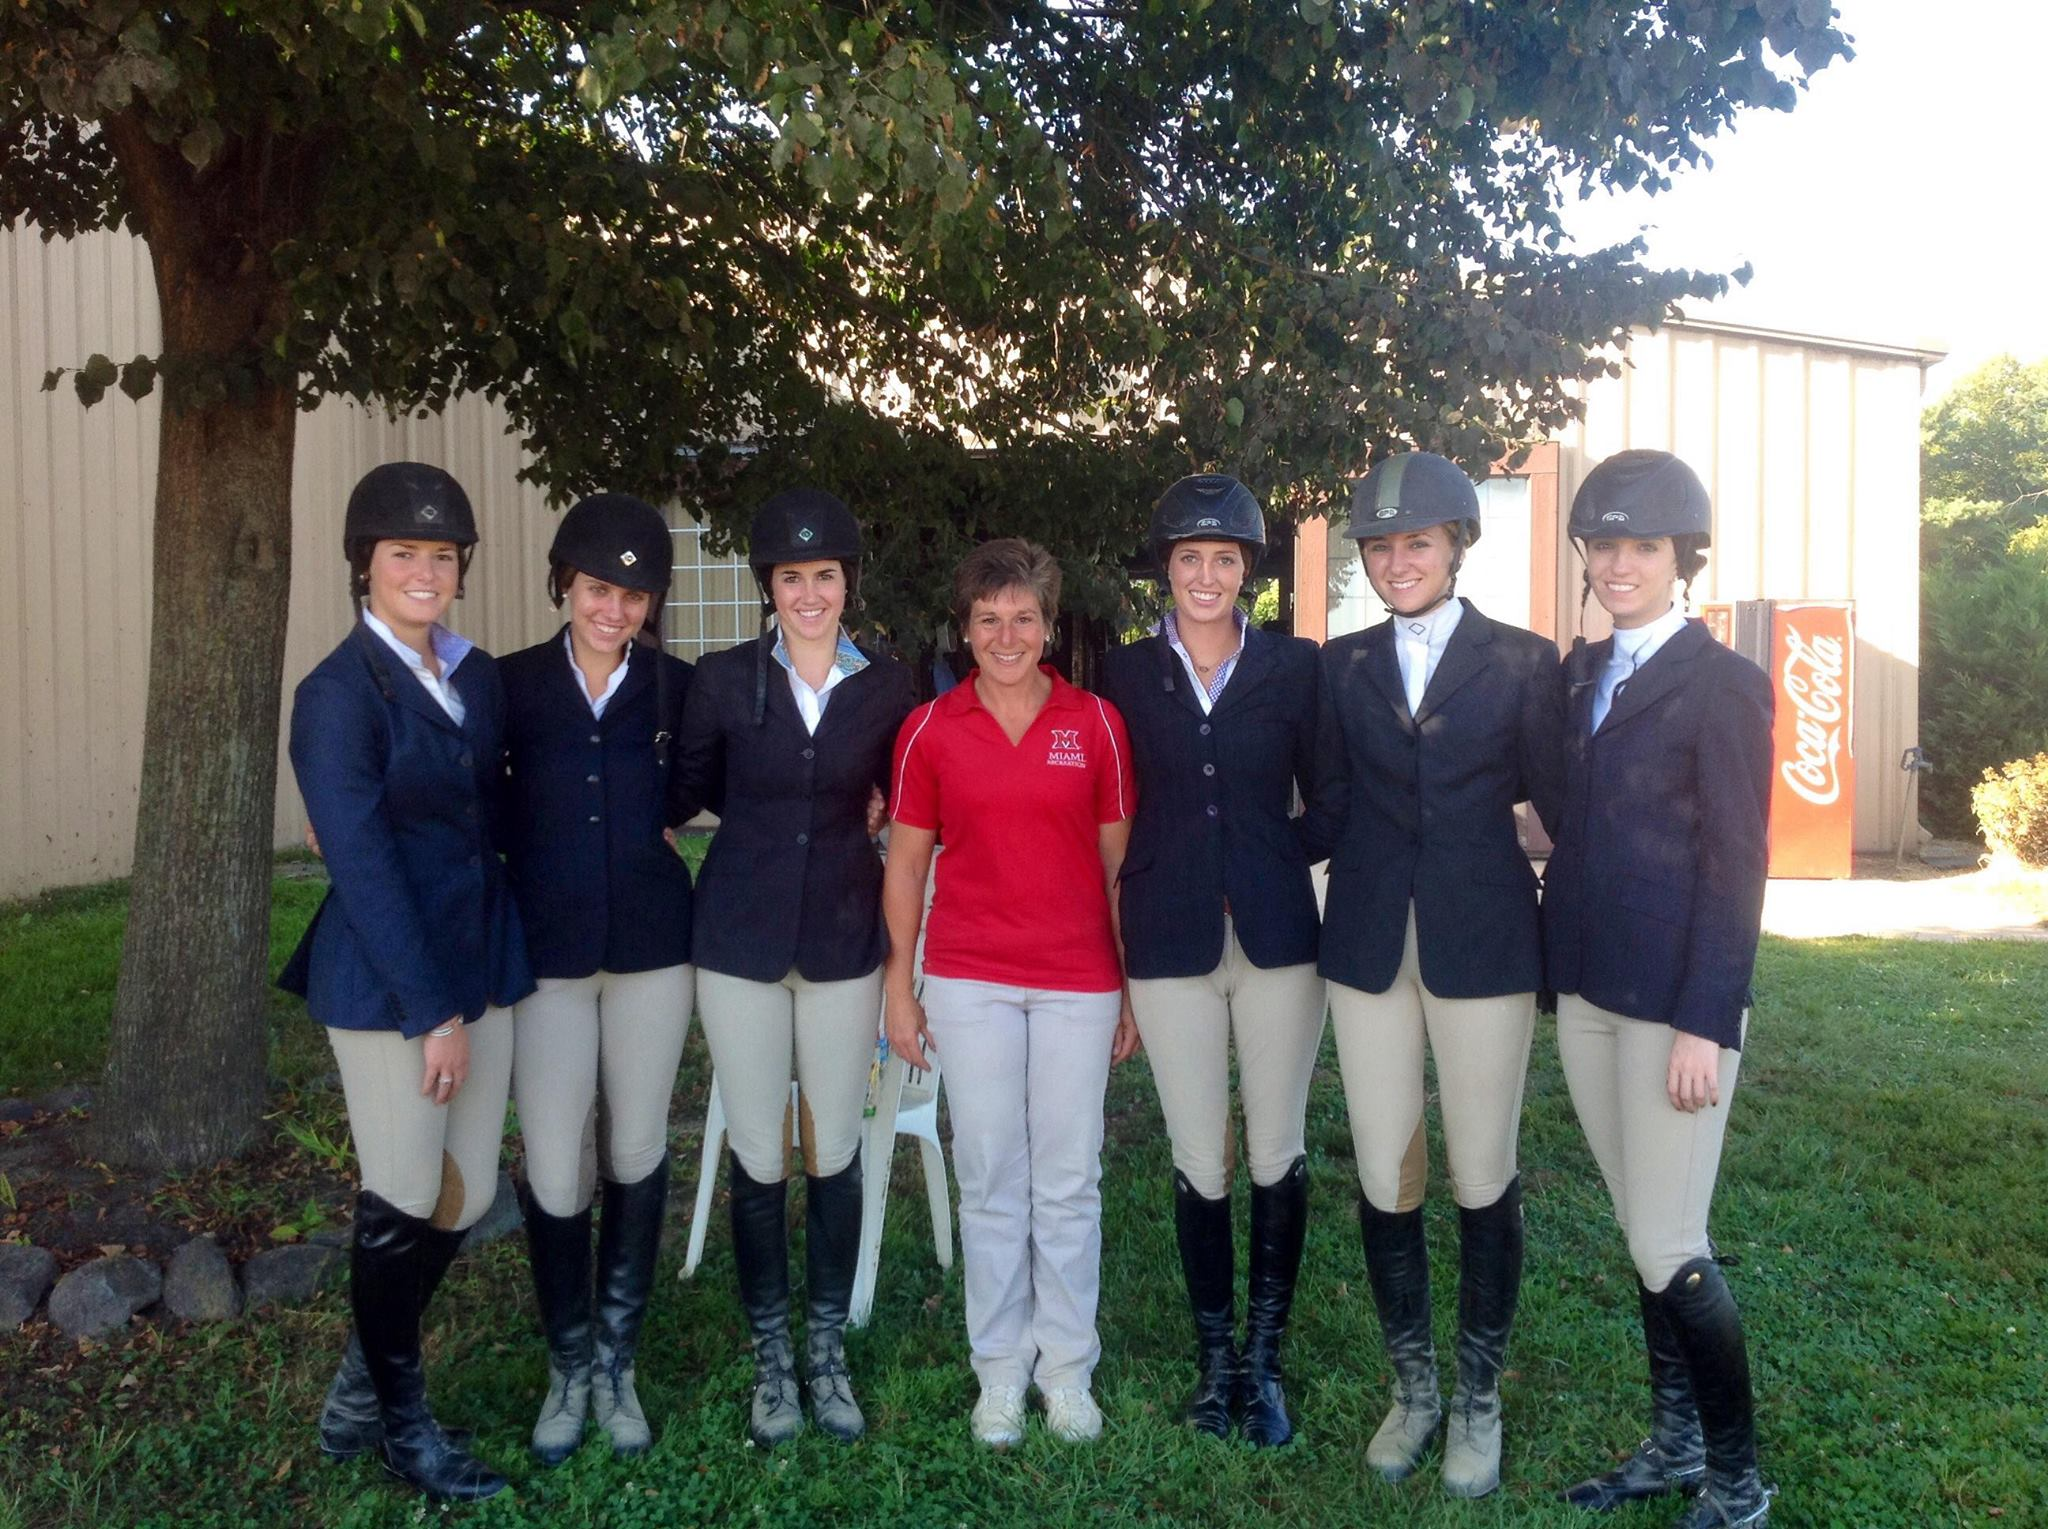 Redhawks Soar In Ncea Scrimmage Miami University Equestrian